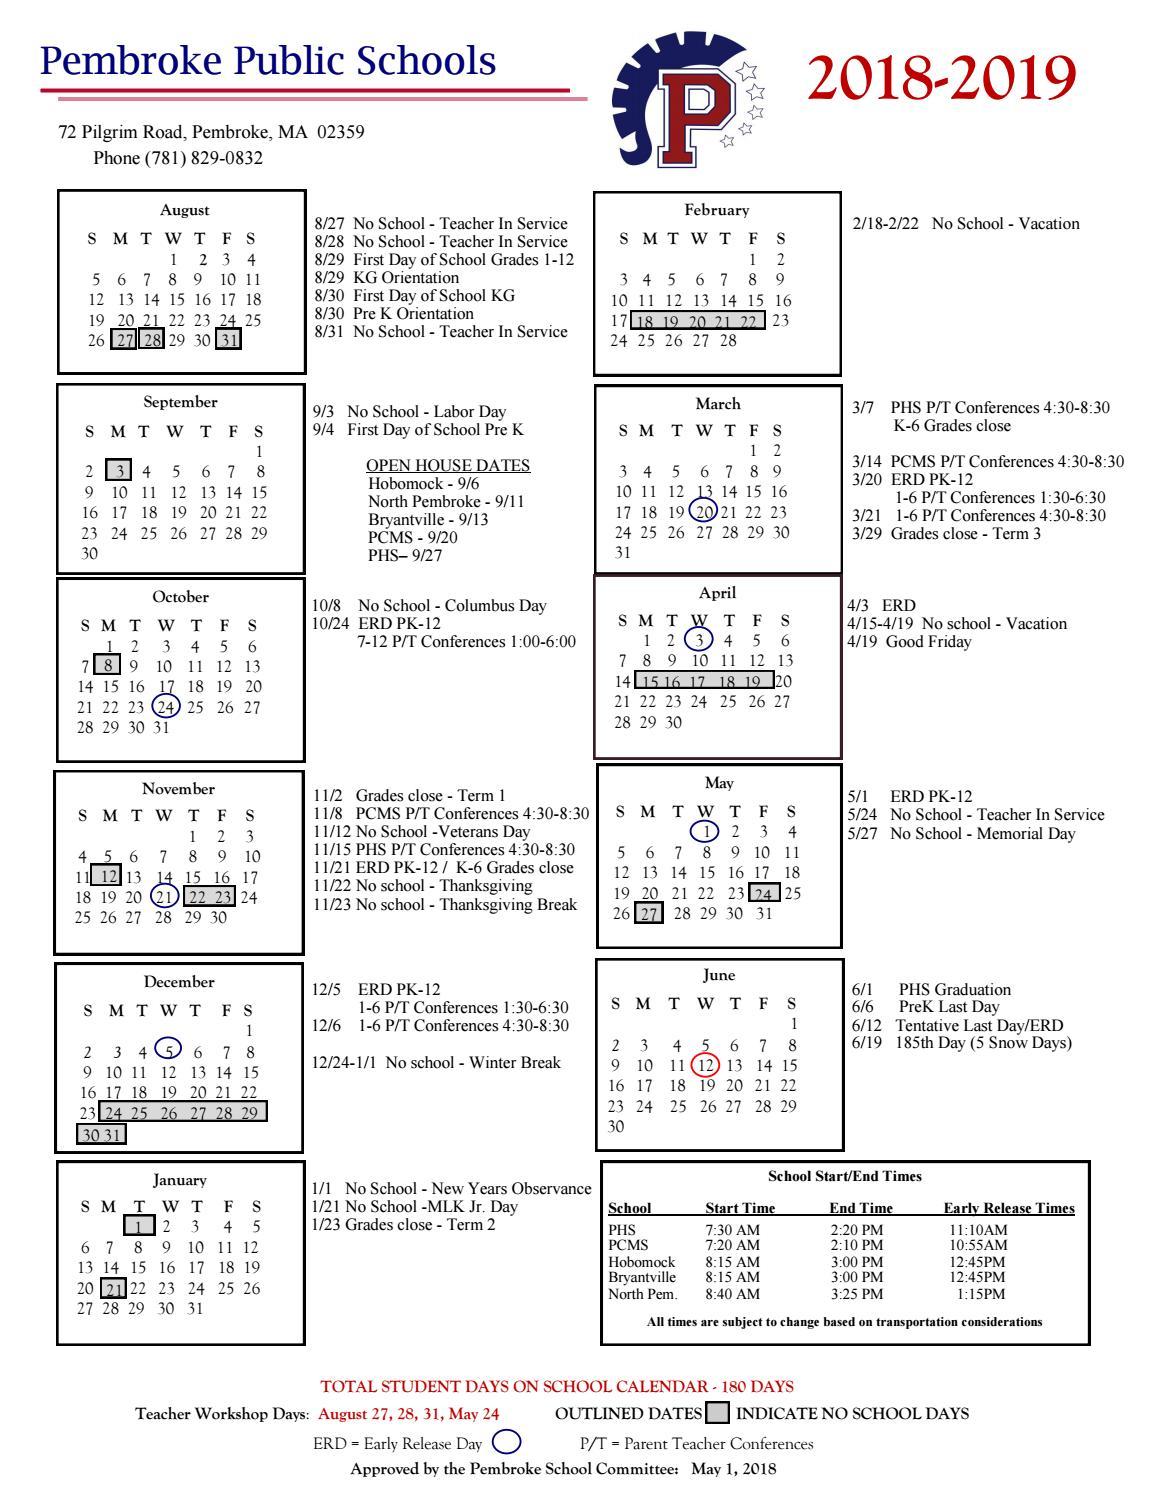 Pembroke Public Schools 2018 2019 Calendar By Pembroke Public